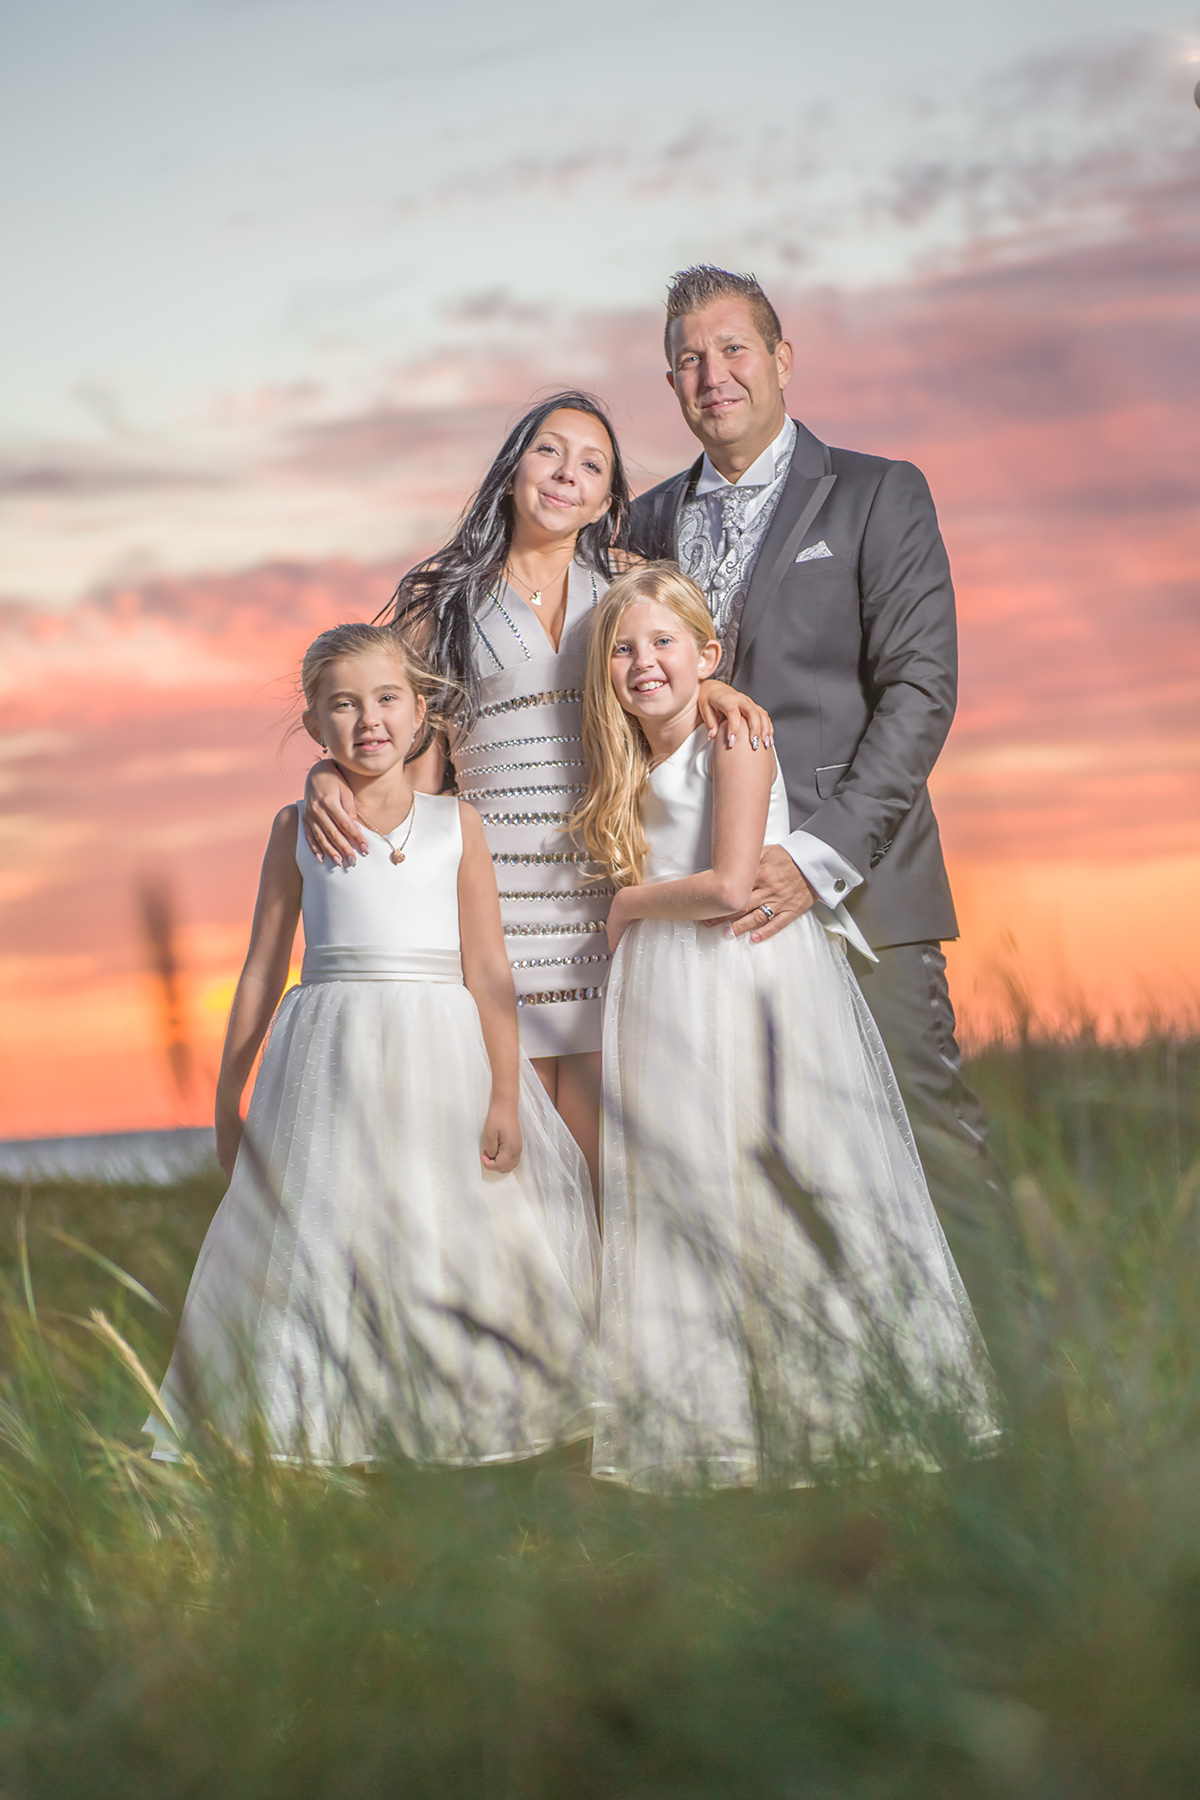 Familjfotograf Helsingborg